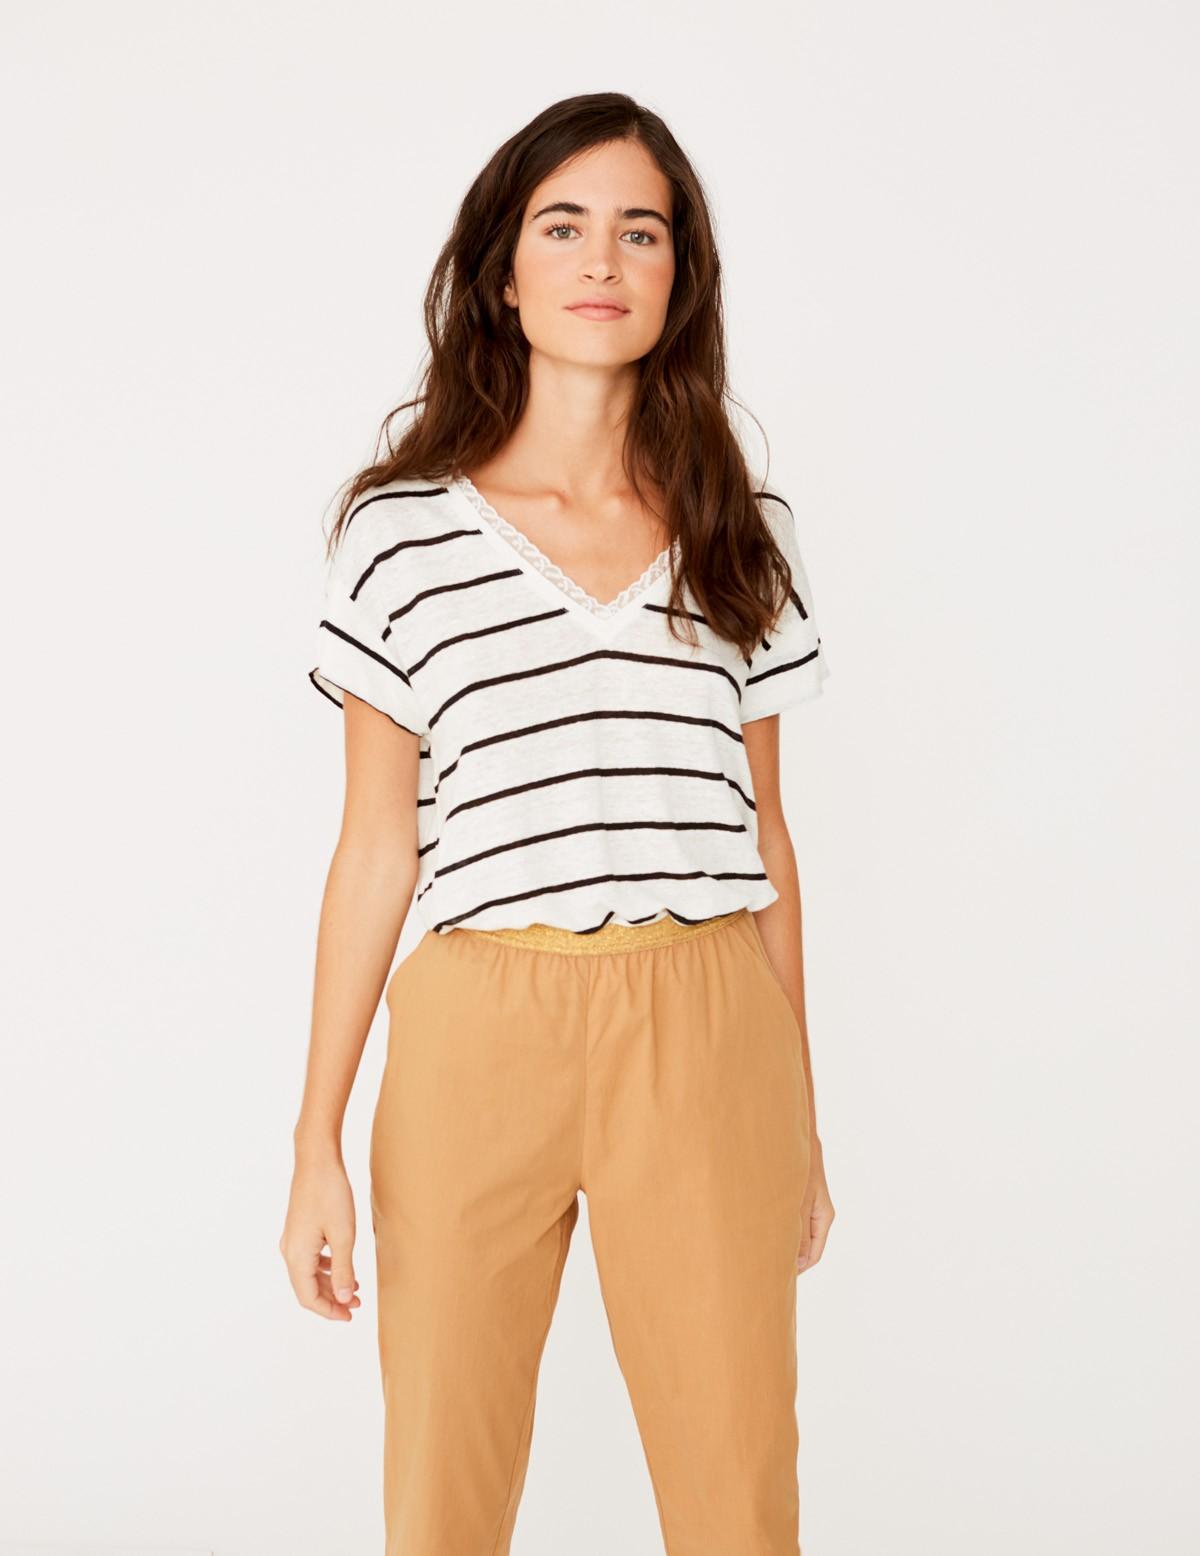 Camiseta de lino rayas